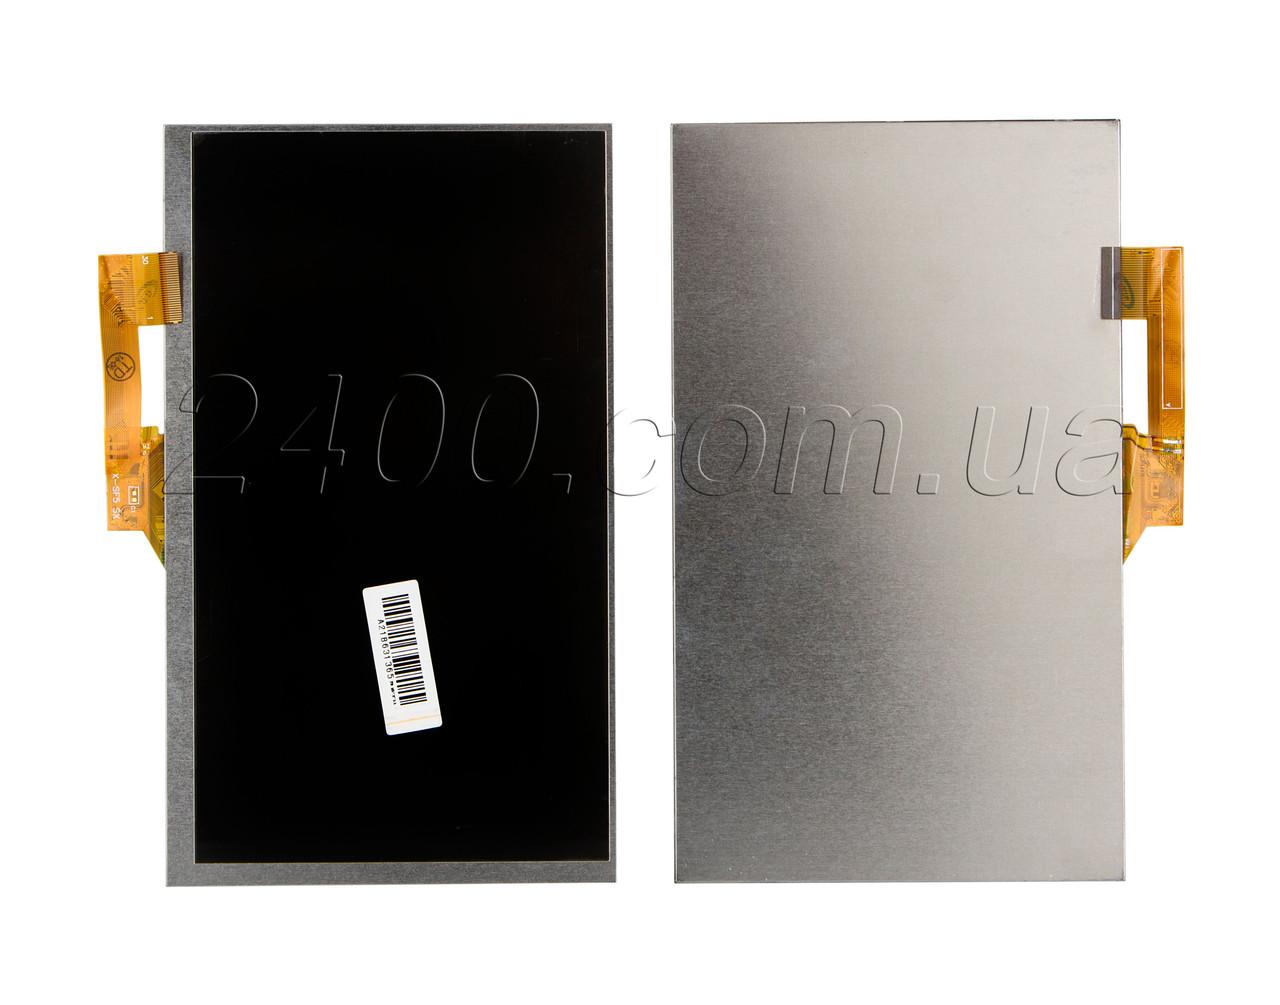 Дисплей - матрица планшета Prestigio GeoVision 7790 30 Pin (экран)